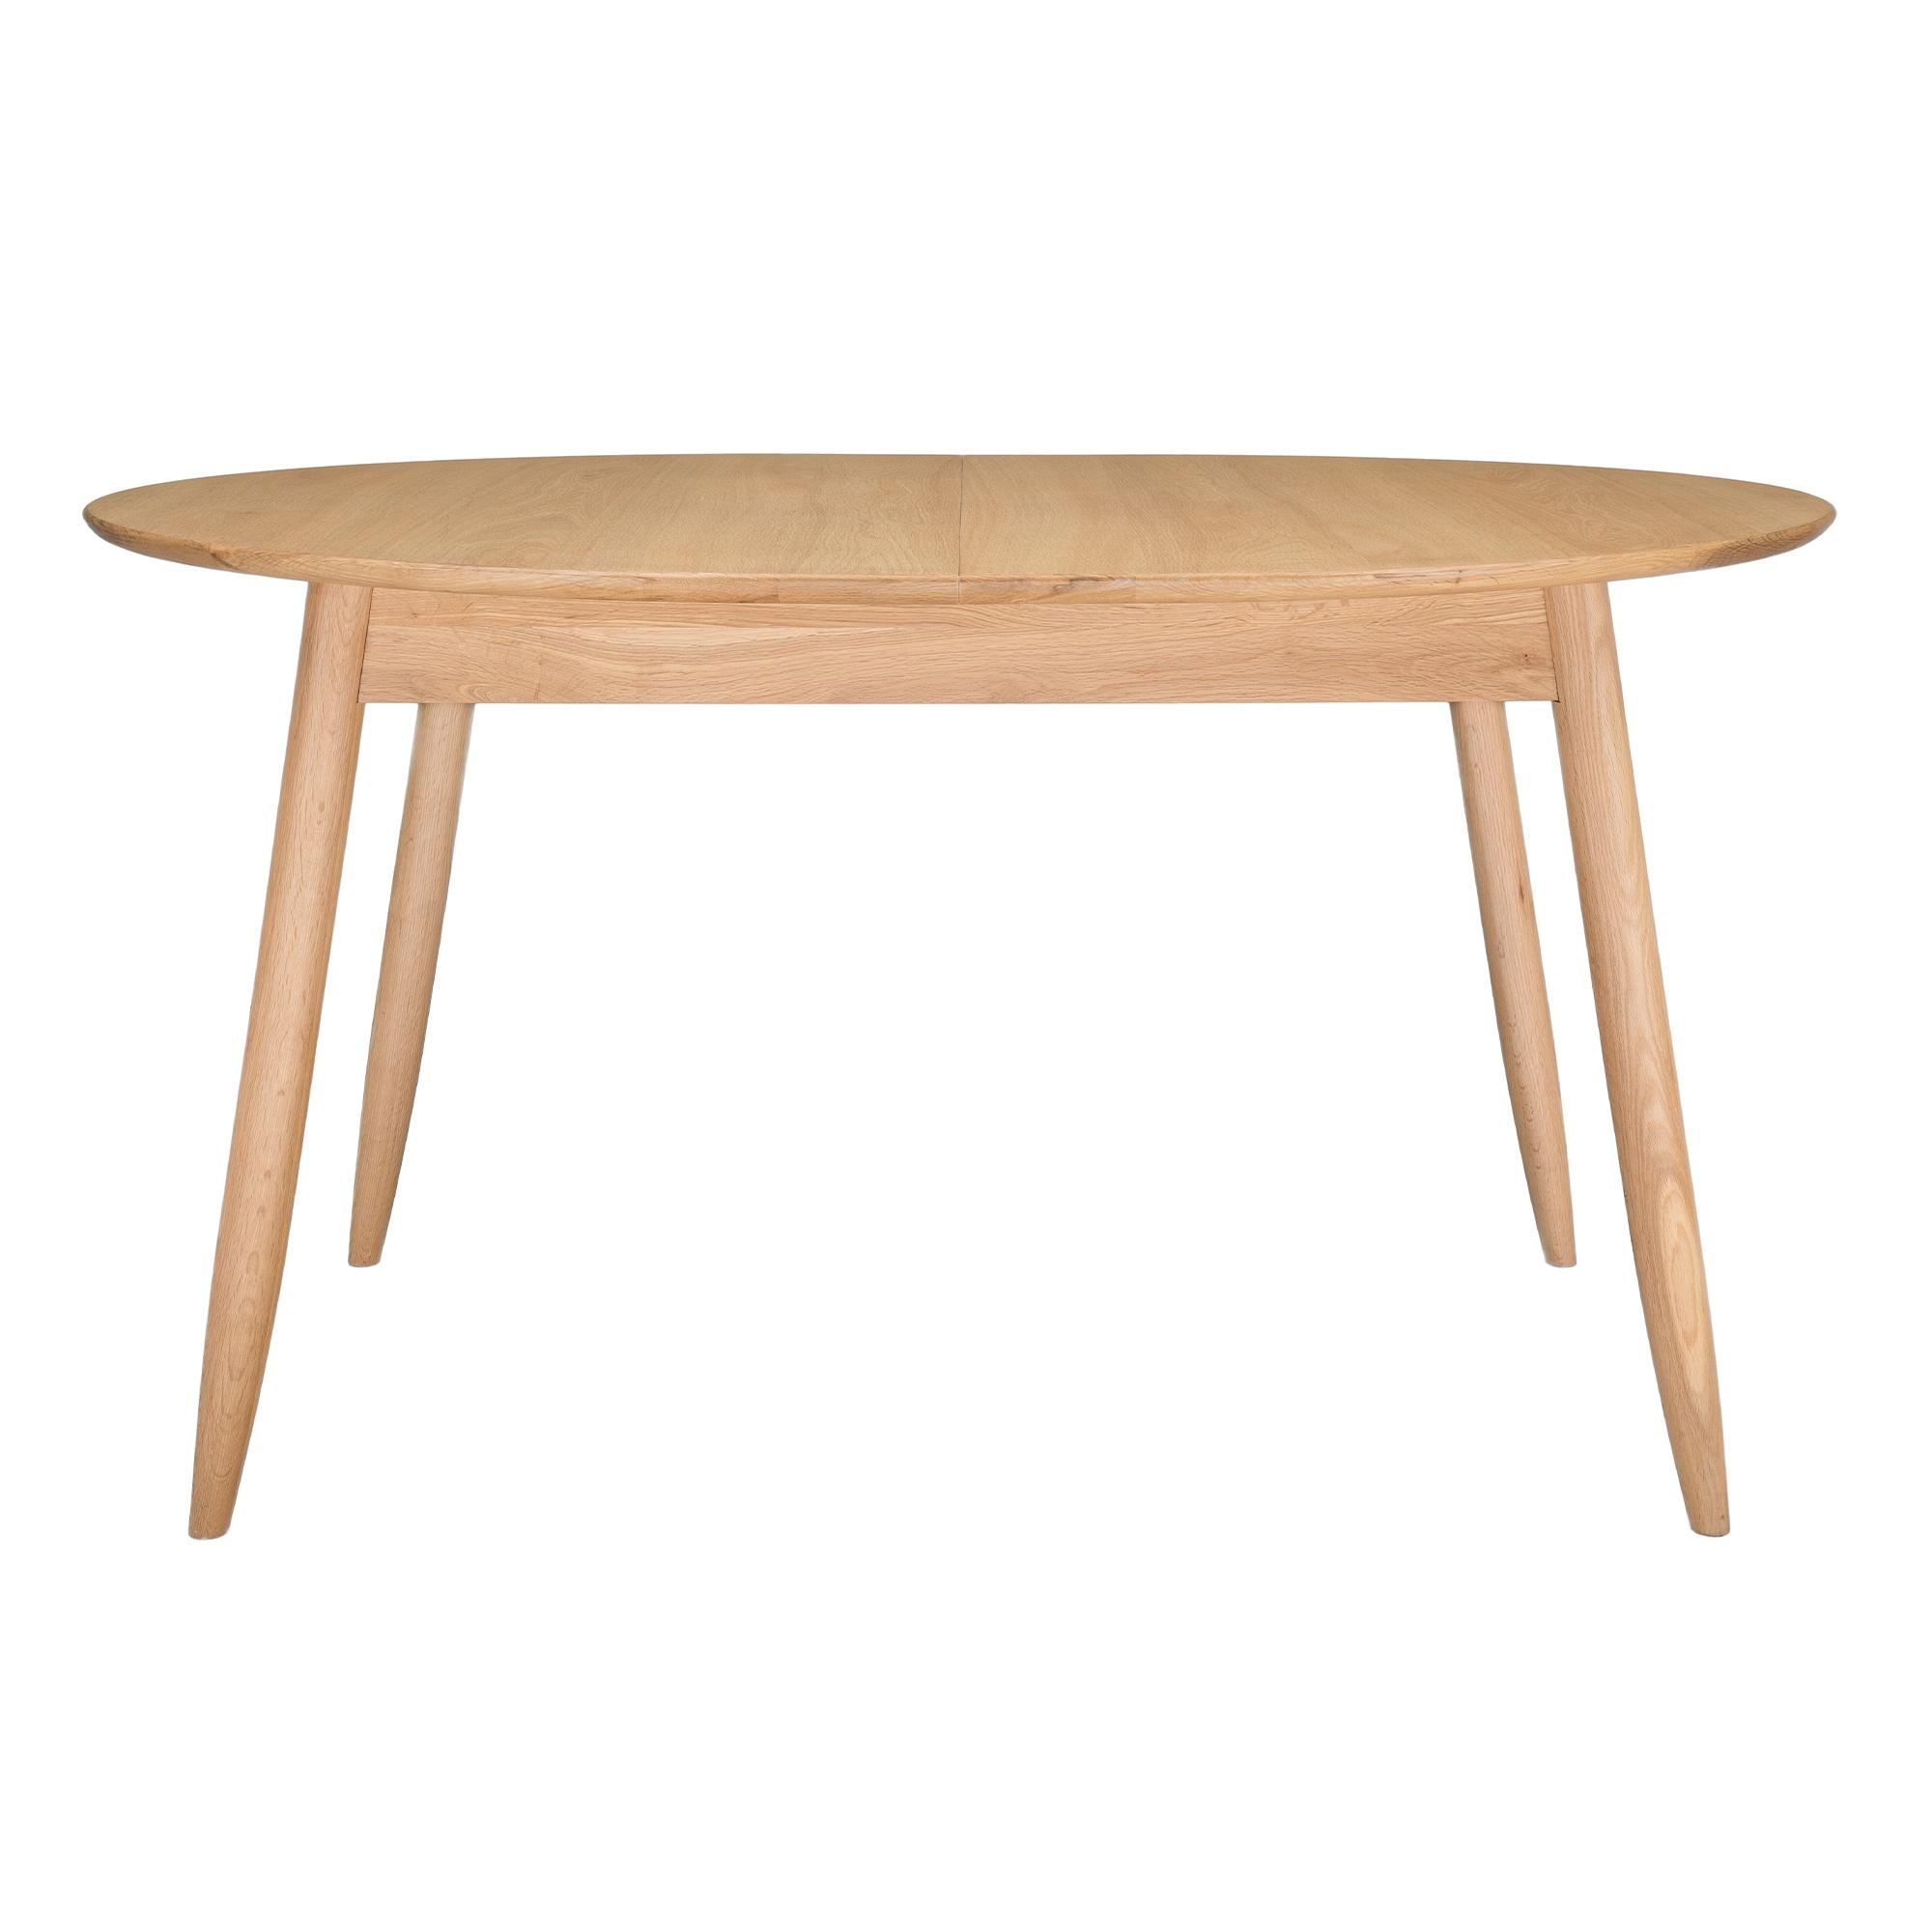 Ercol Teramo Small Extending Dining Table Ercol Cookes Furniture